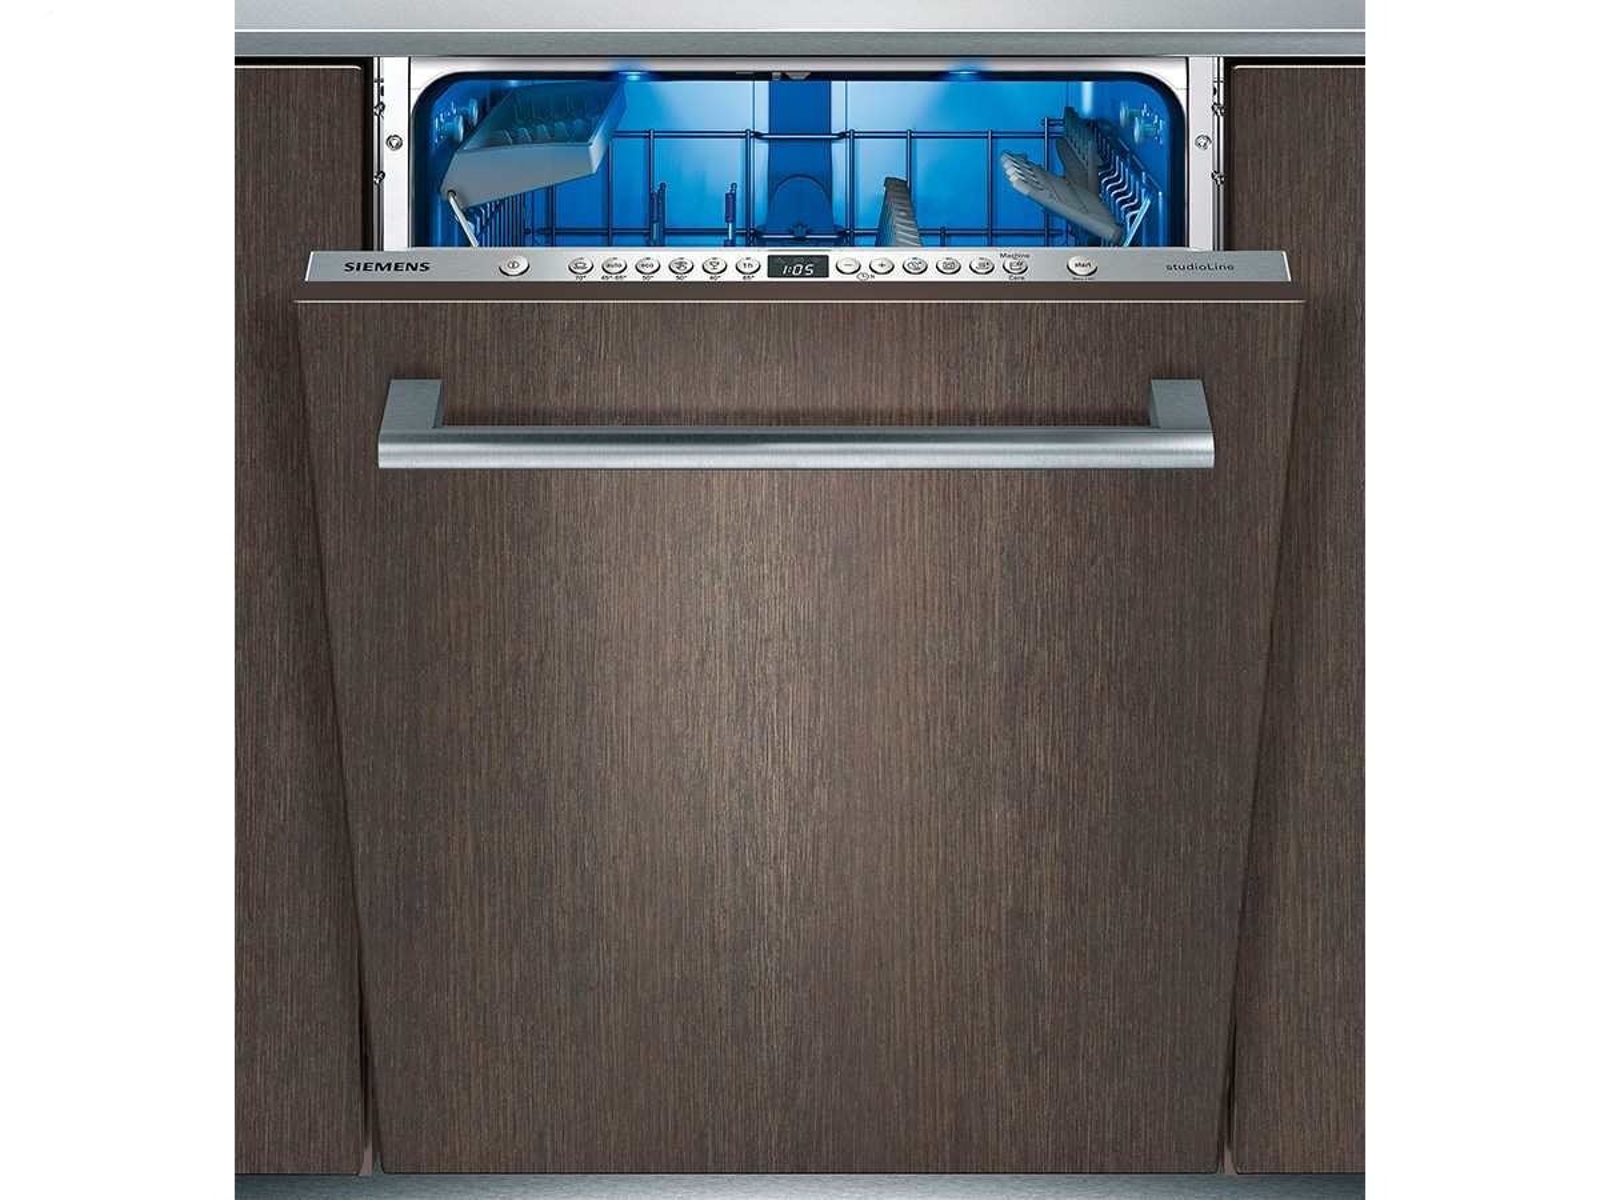 Siemens Kühlschrank Xxl : Siemens studioline sx pe vollintegrierbarer